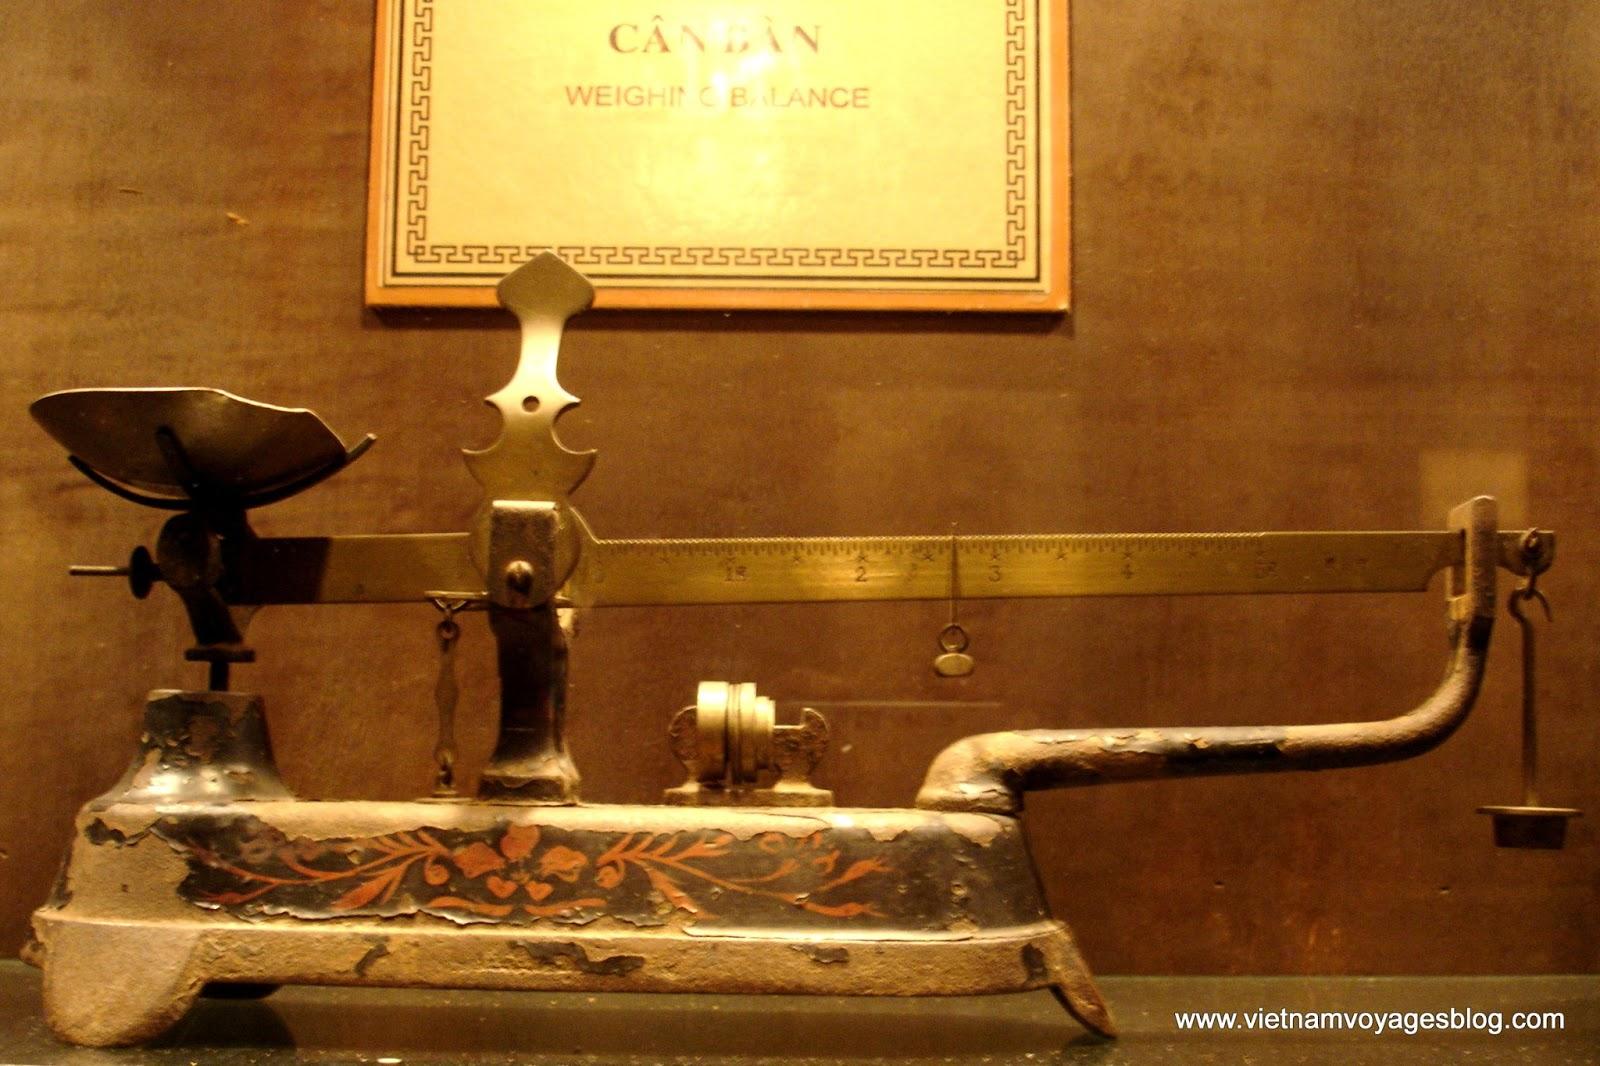 Tham quan bảo tàng y học cổ truyền Fito